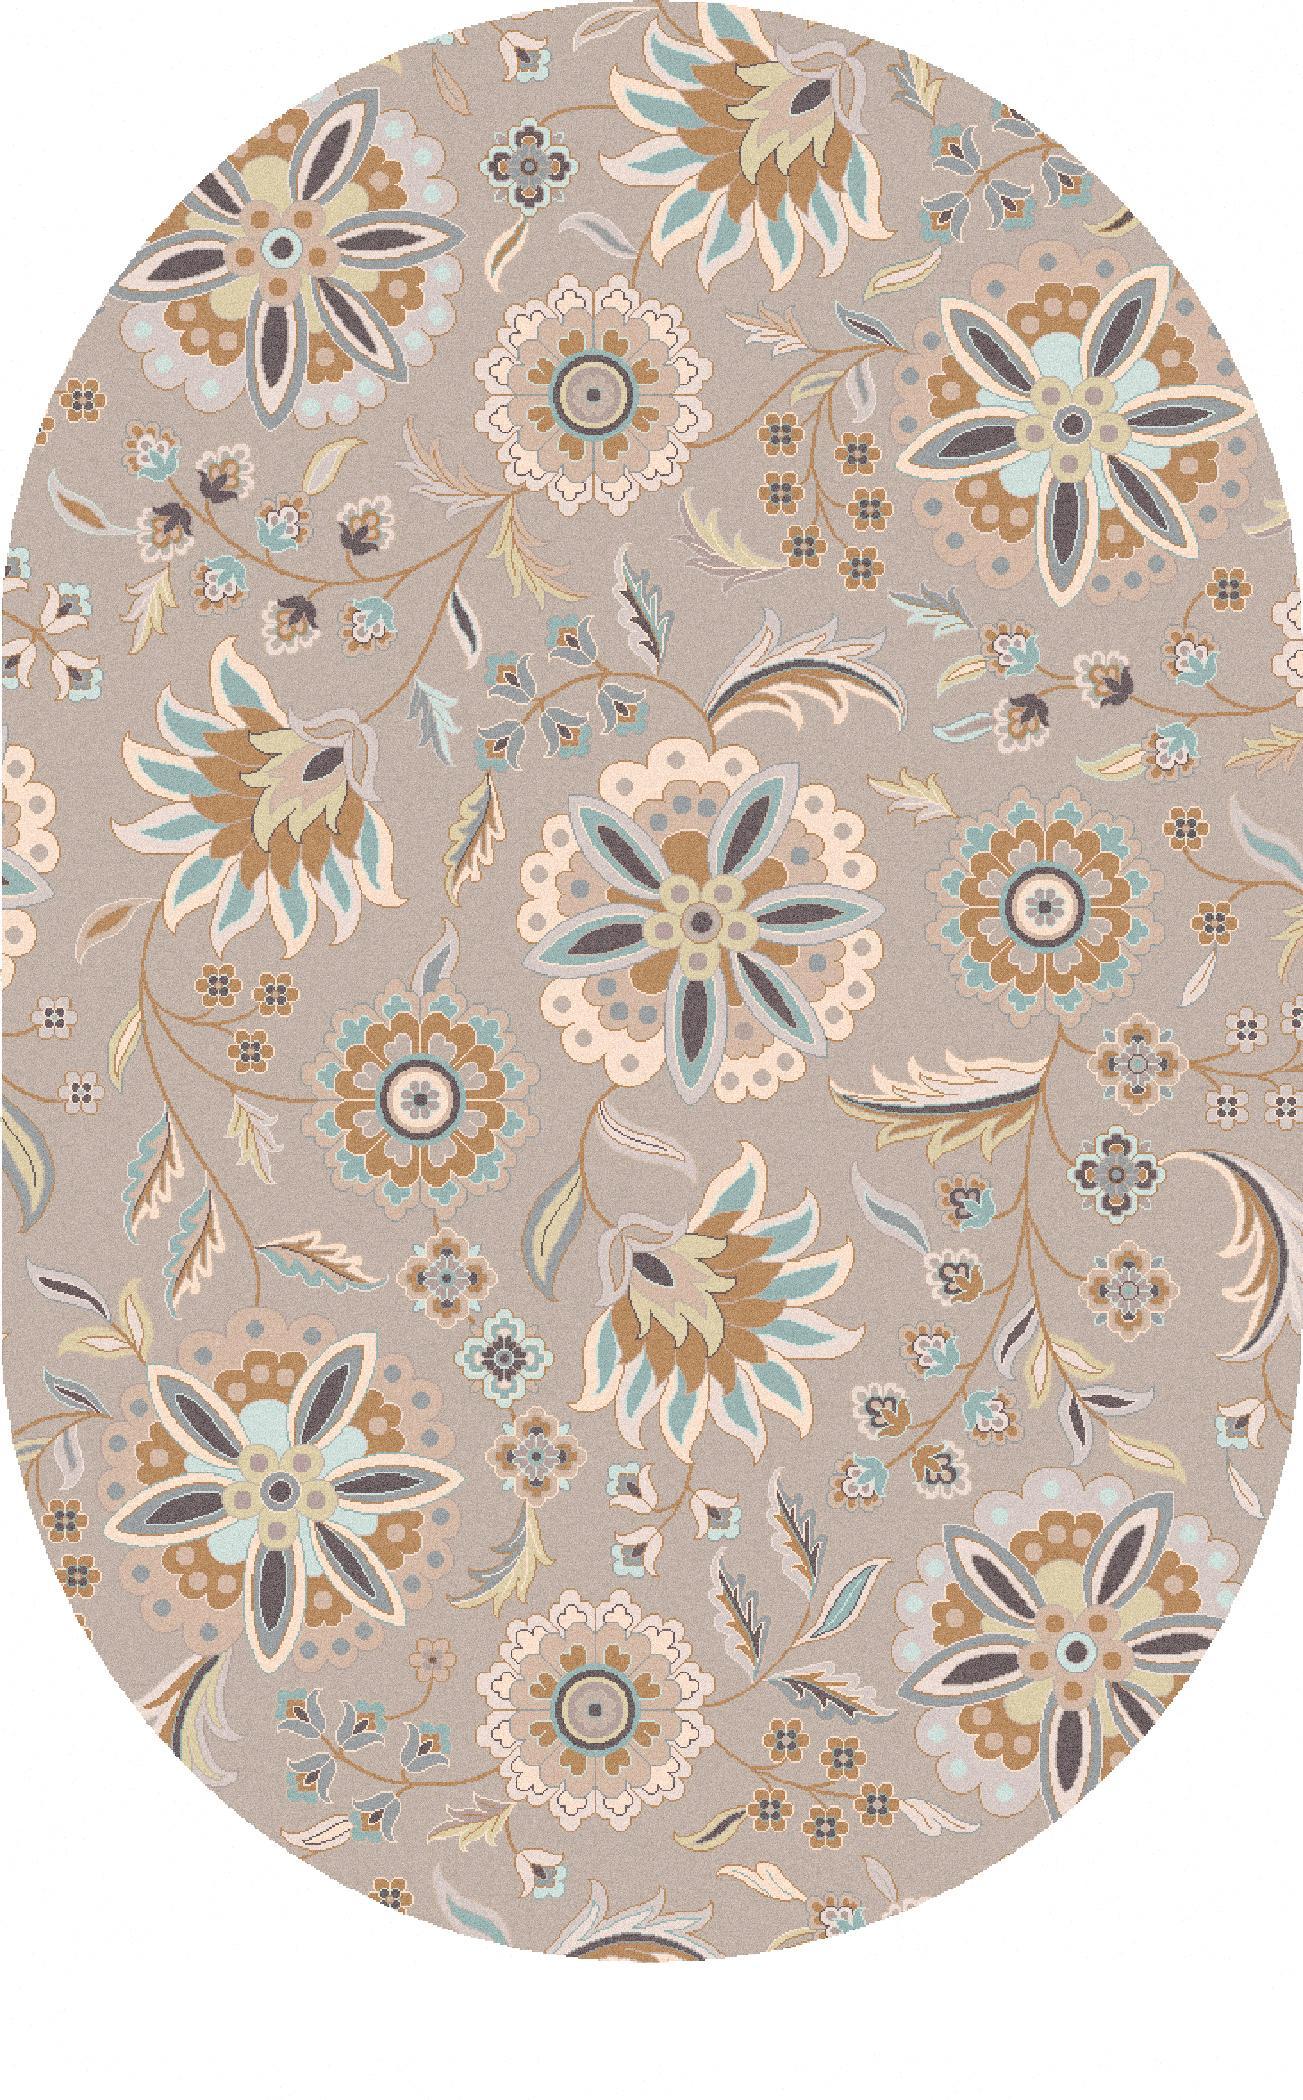 Surya Rugs Athena 8' x 10' Oval - Item Number: ATH5127-810OV